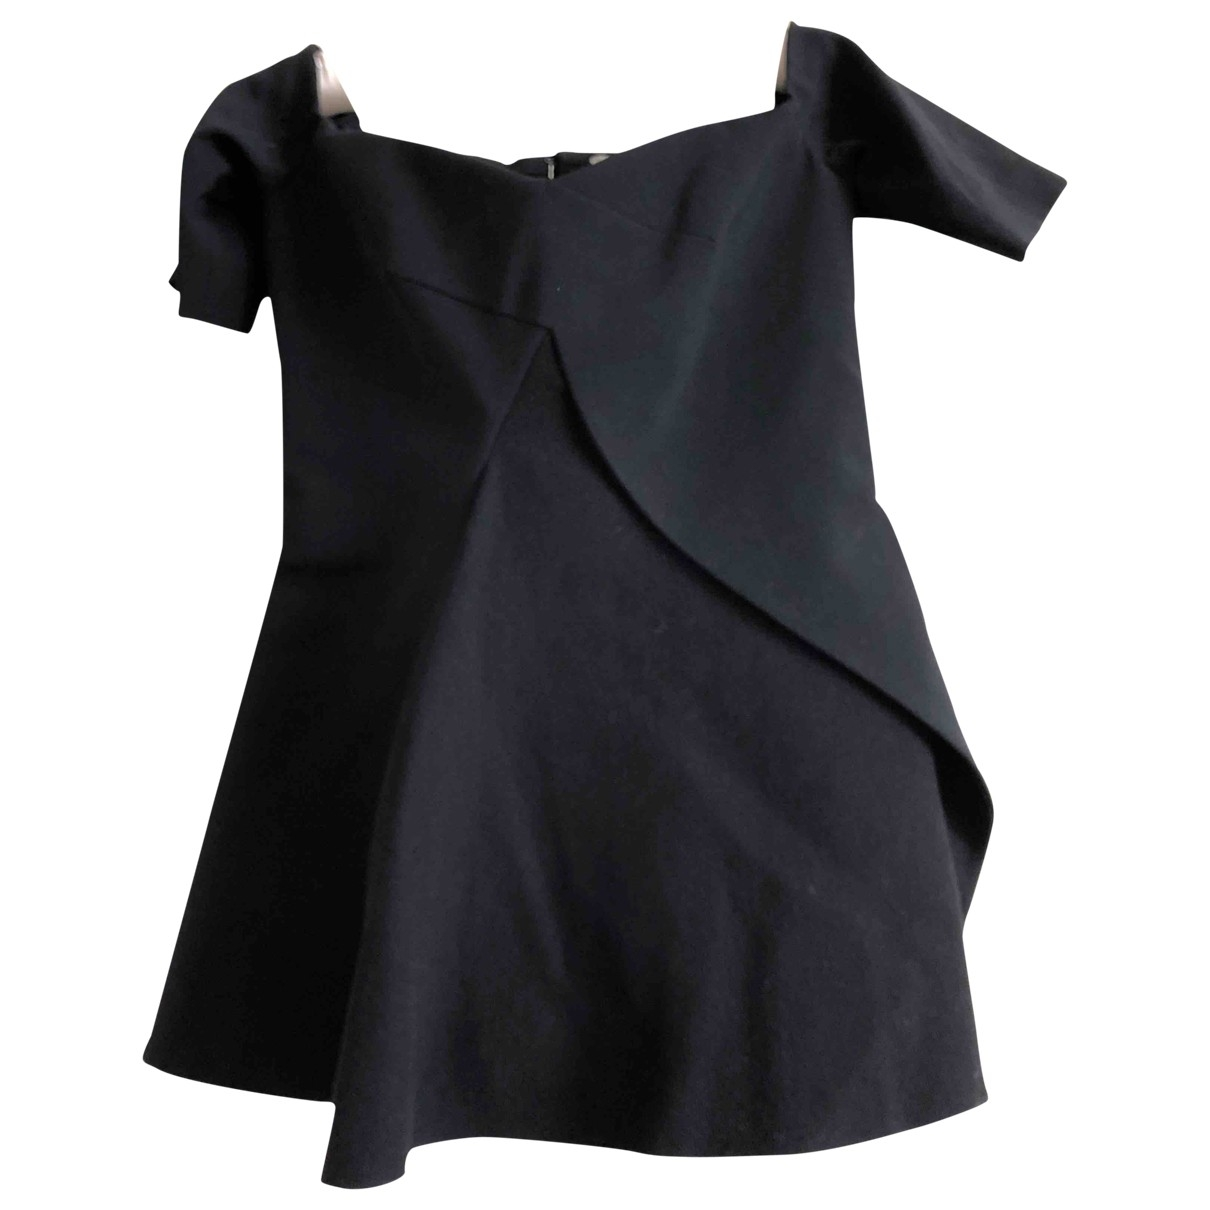 Stella Mccartney \N Top in  Schwarz Wolle